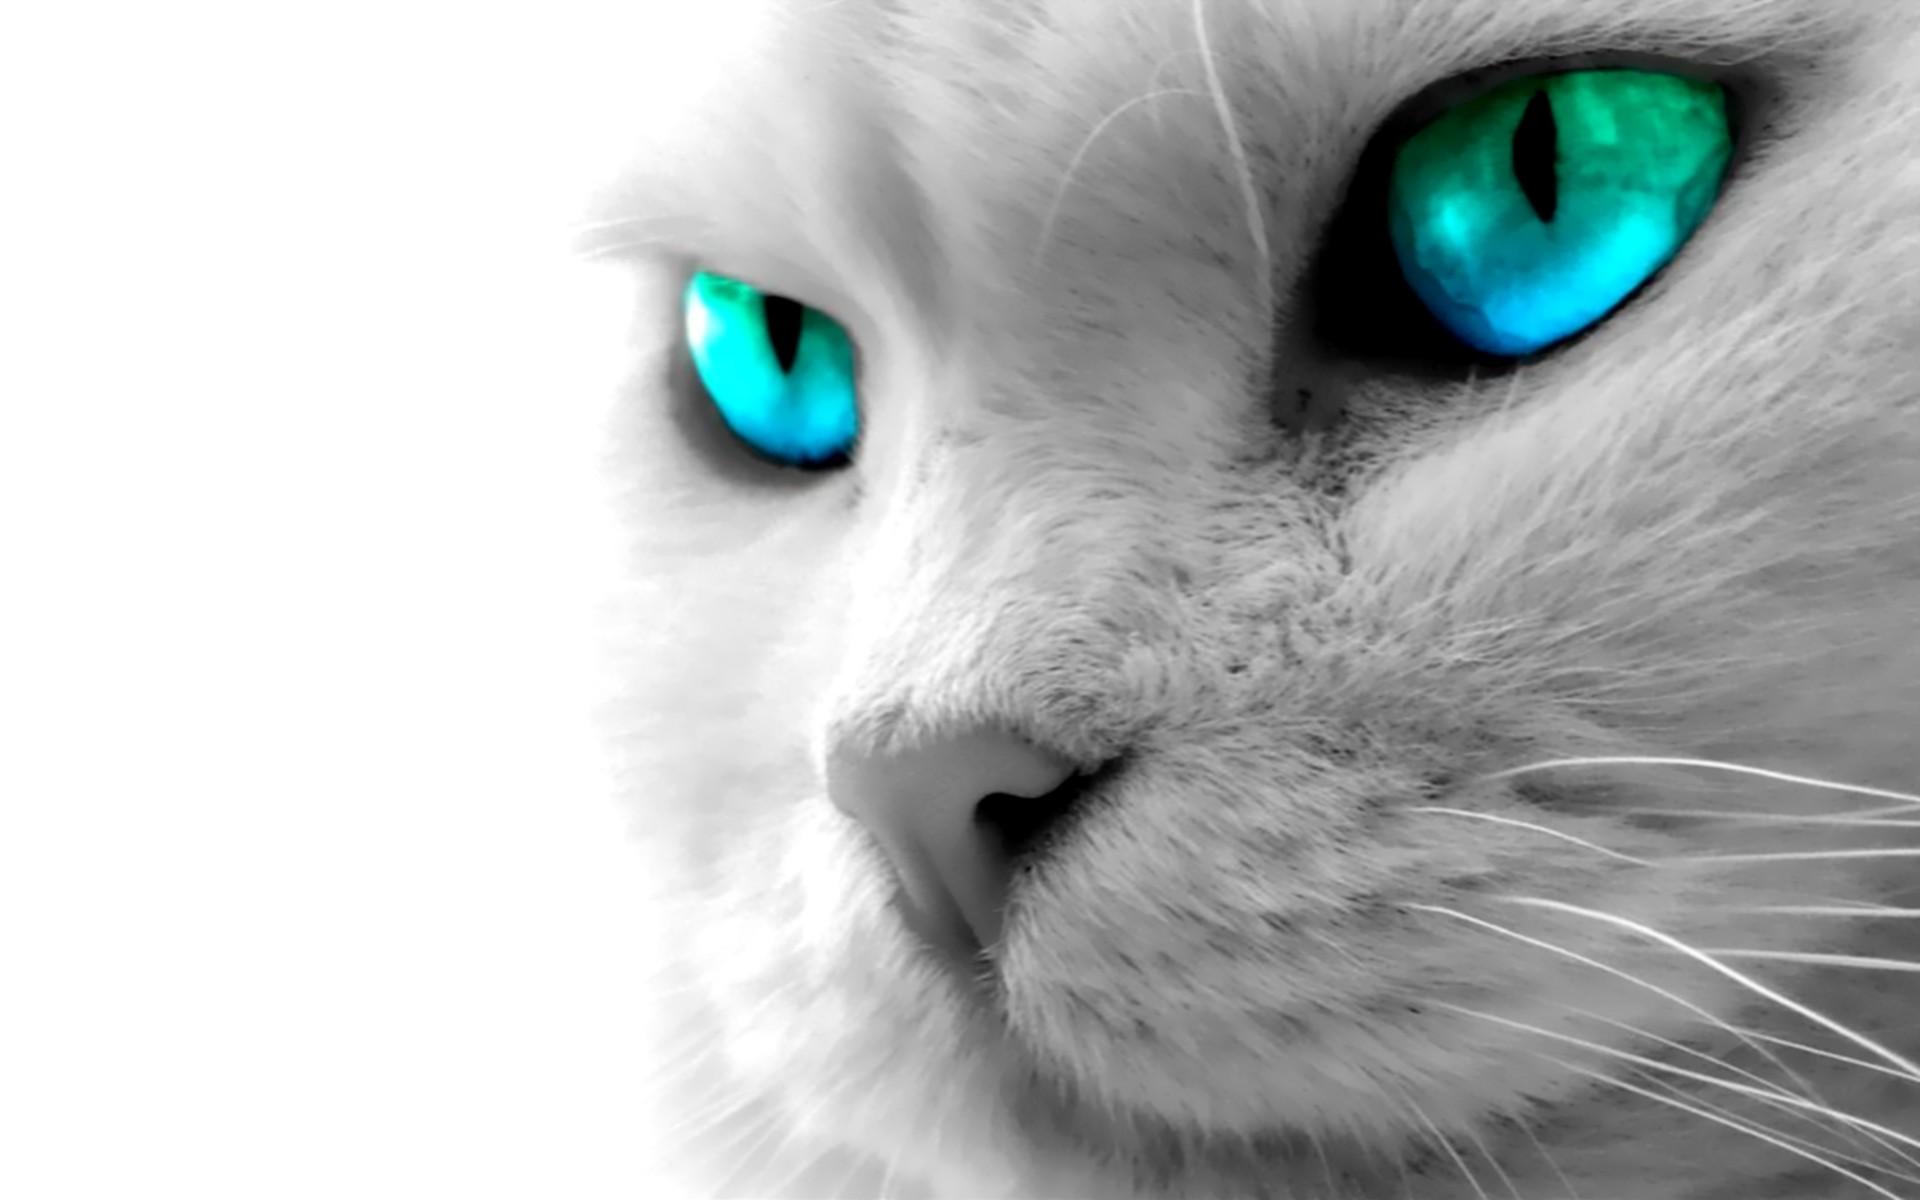 Amazing-HD-Cat-Wallpaper